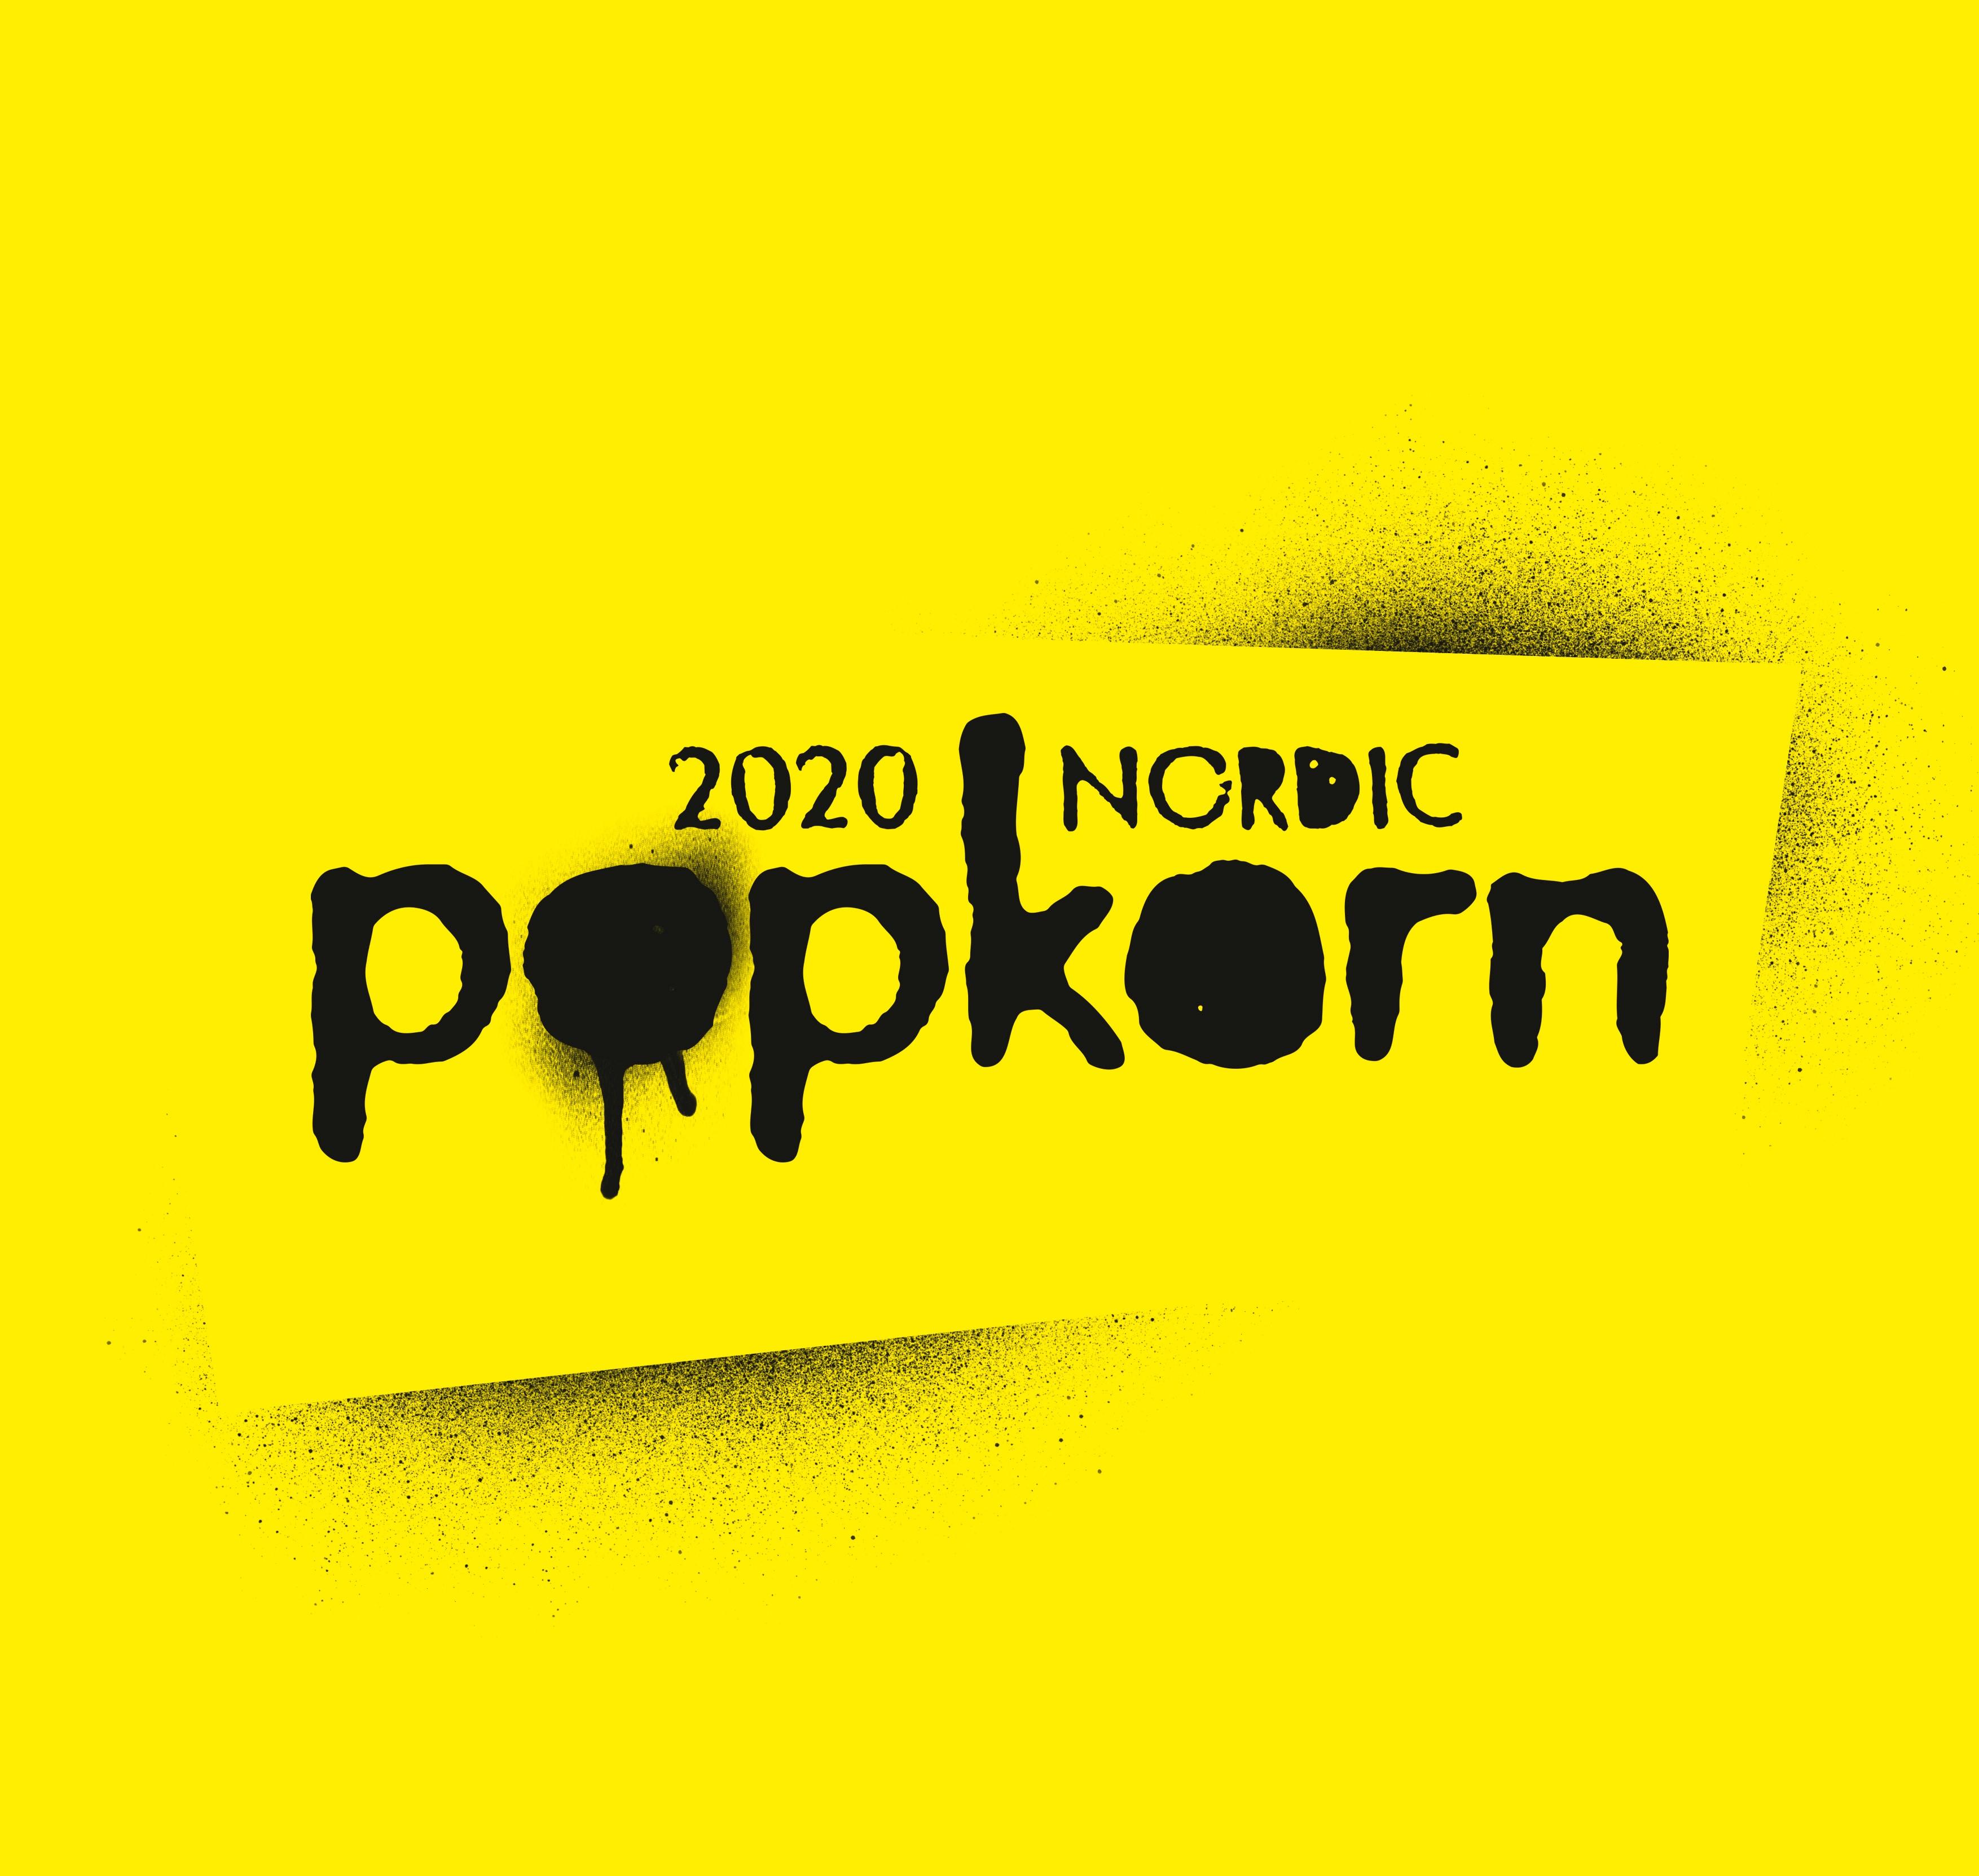 Popkorn 2020 logo.png